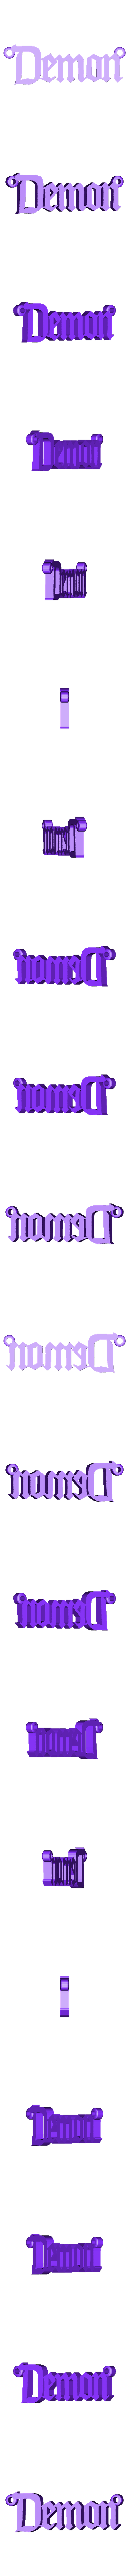 demon.stl Download STL file Angel/Daddy/Demon/Baby necklace pack • 3D printer object, merjofre